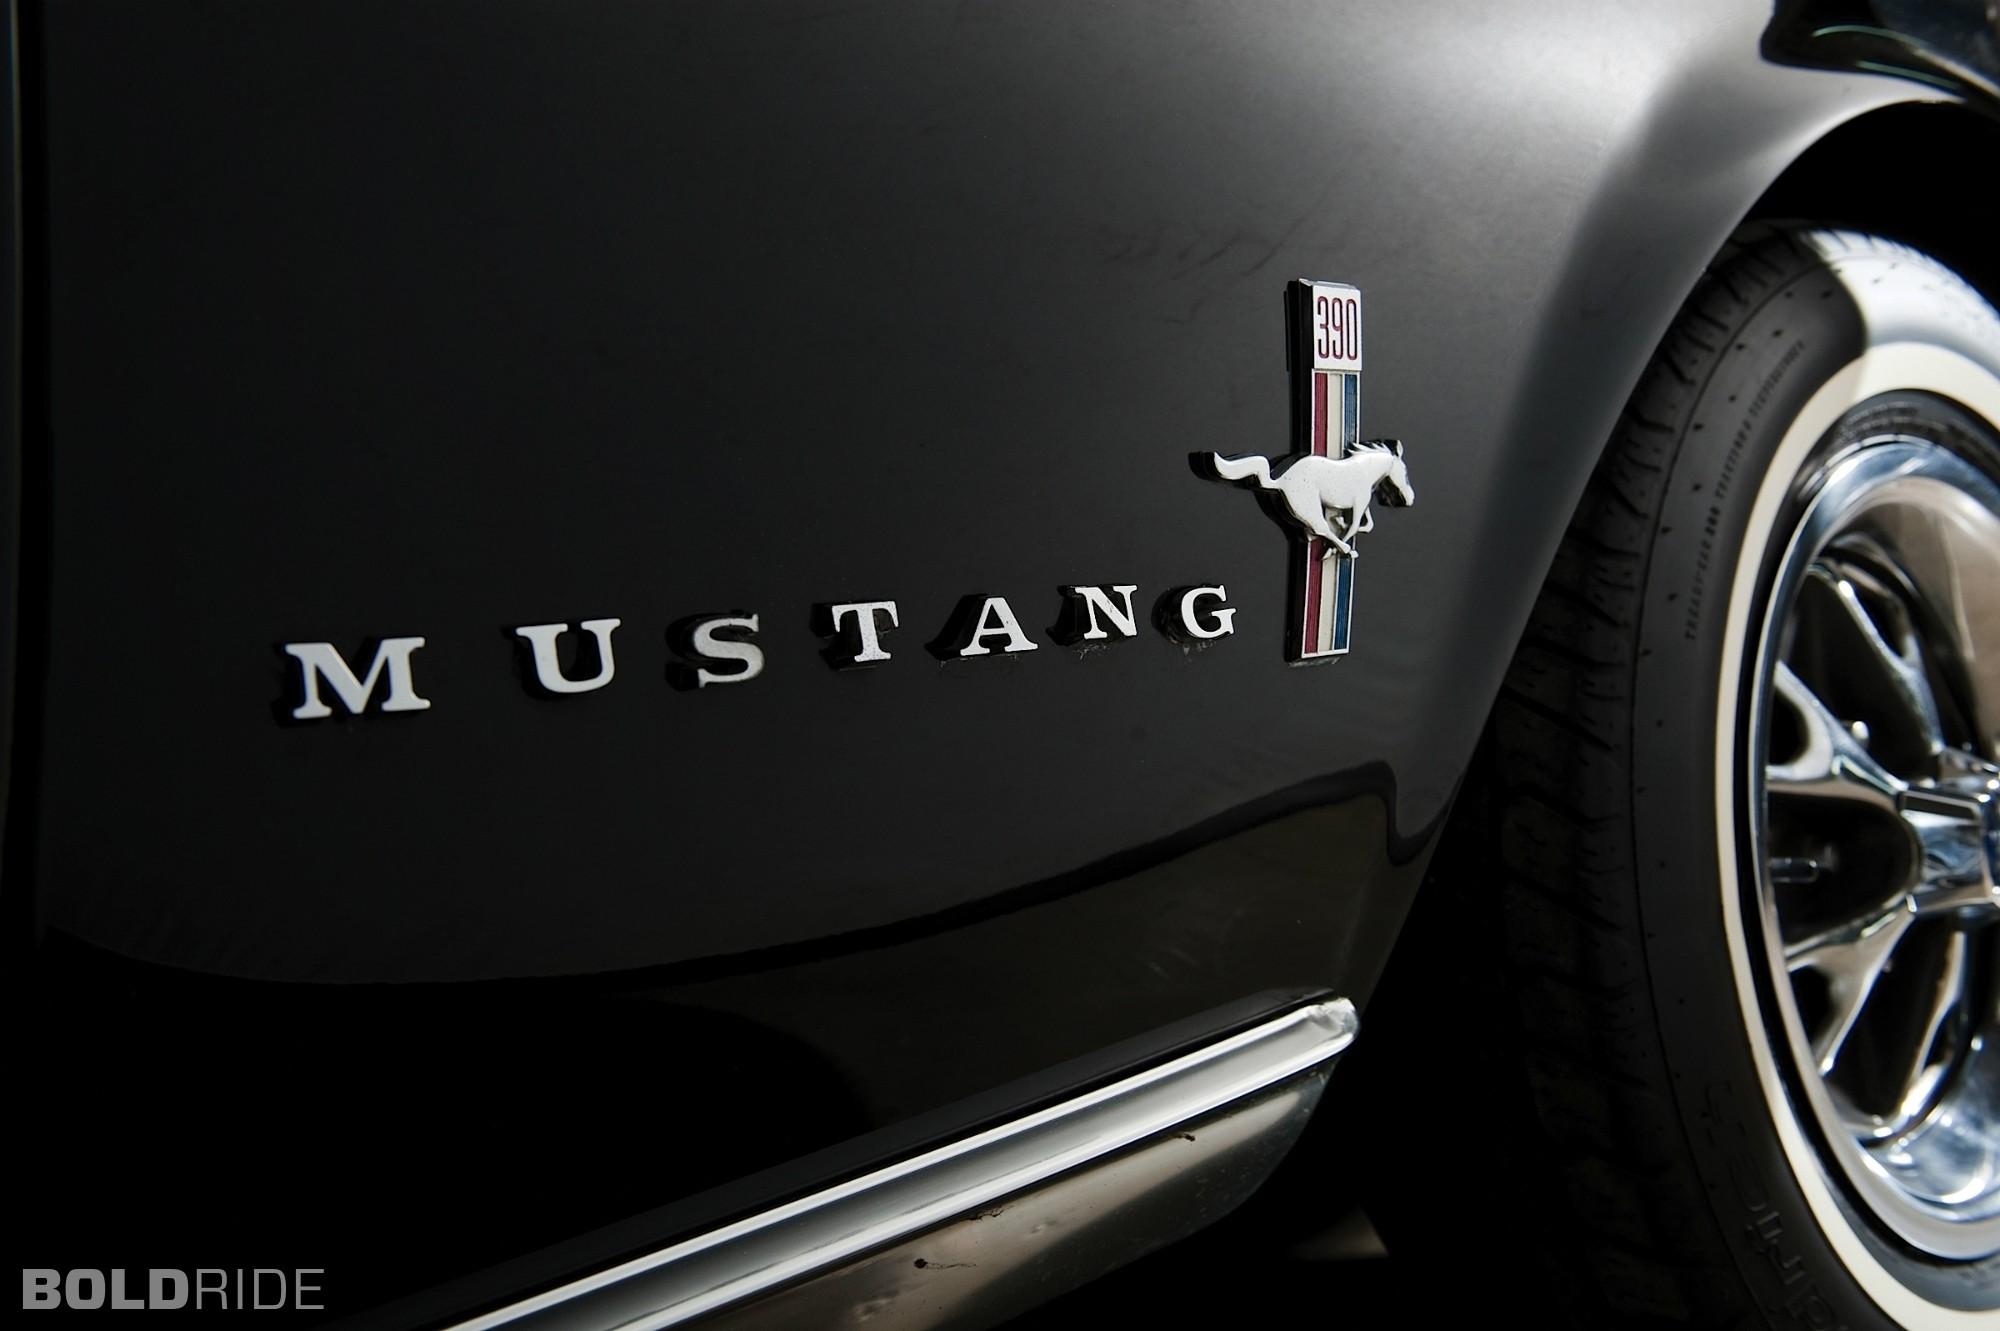 Best Wallpaper Logo Ford Mustang - 914899-popular-mustang-logo-wallpaper-2000x1331-for-lockscreen  Trends_183168.jpg